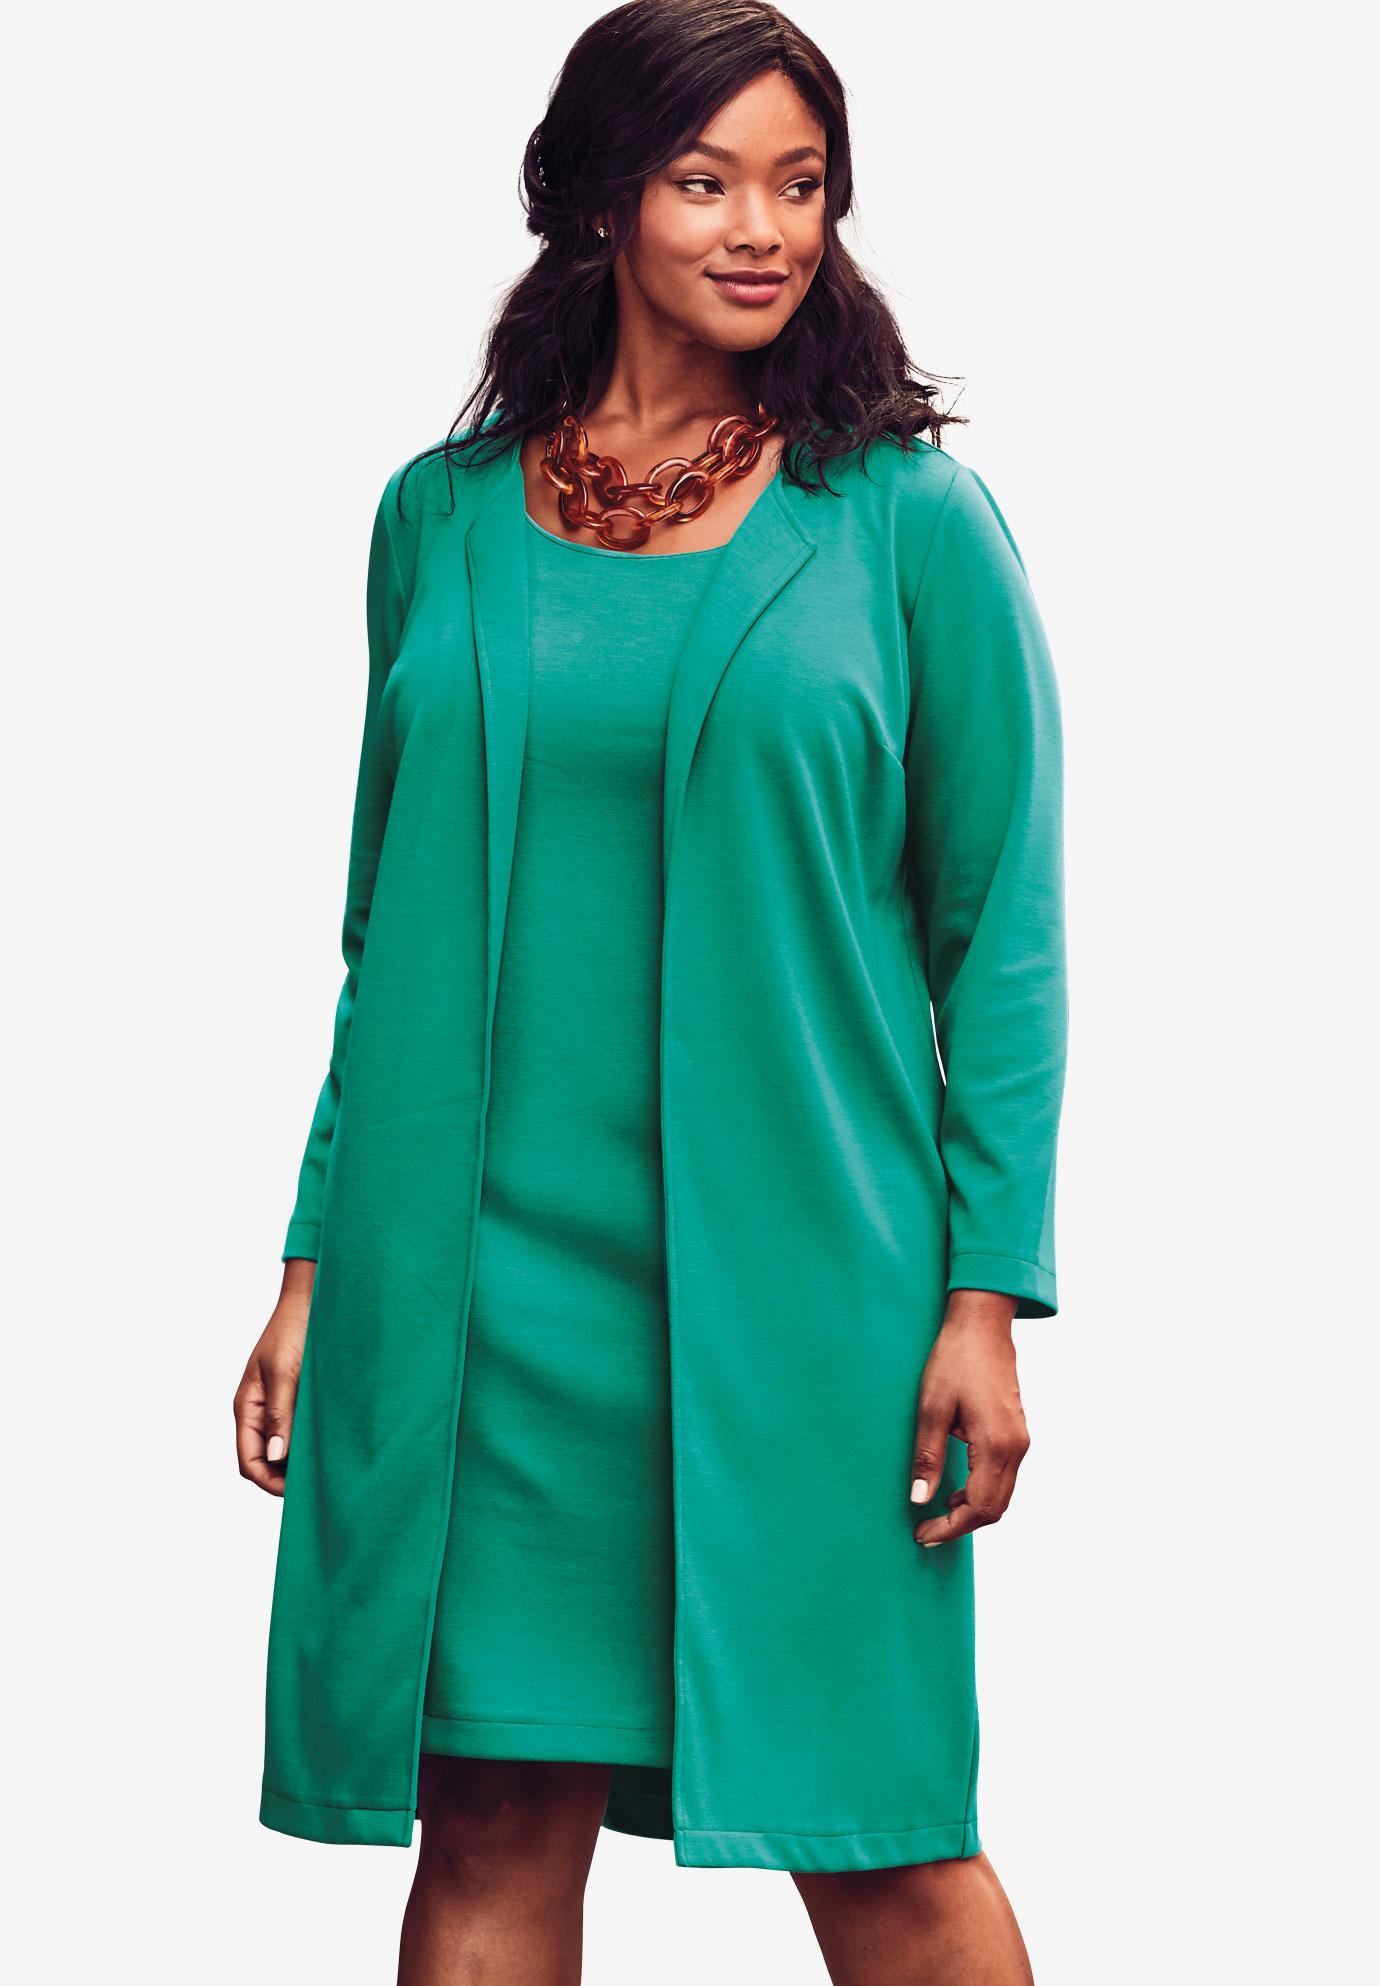 2-Piece Ponté Knit Jacket Dress| Plus Size Sets | Full Beauty